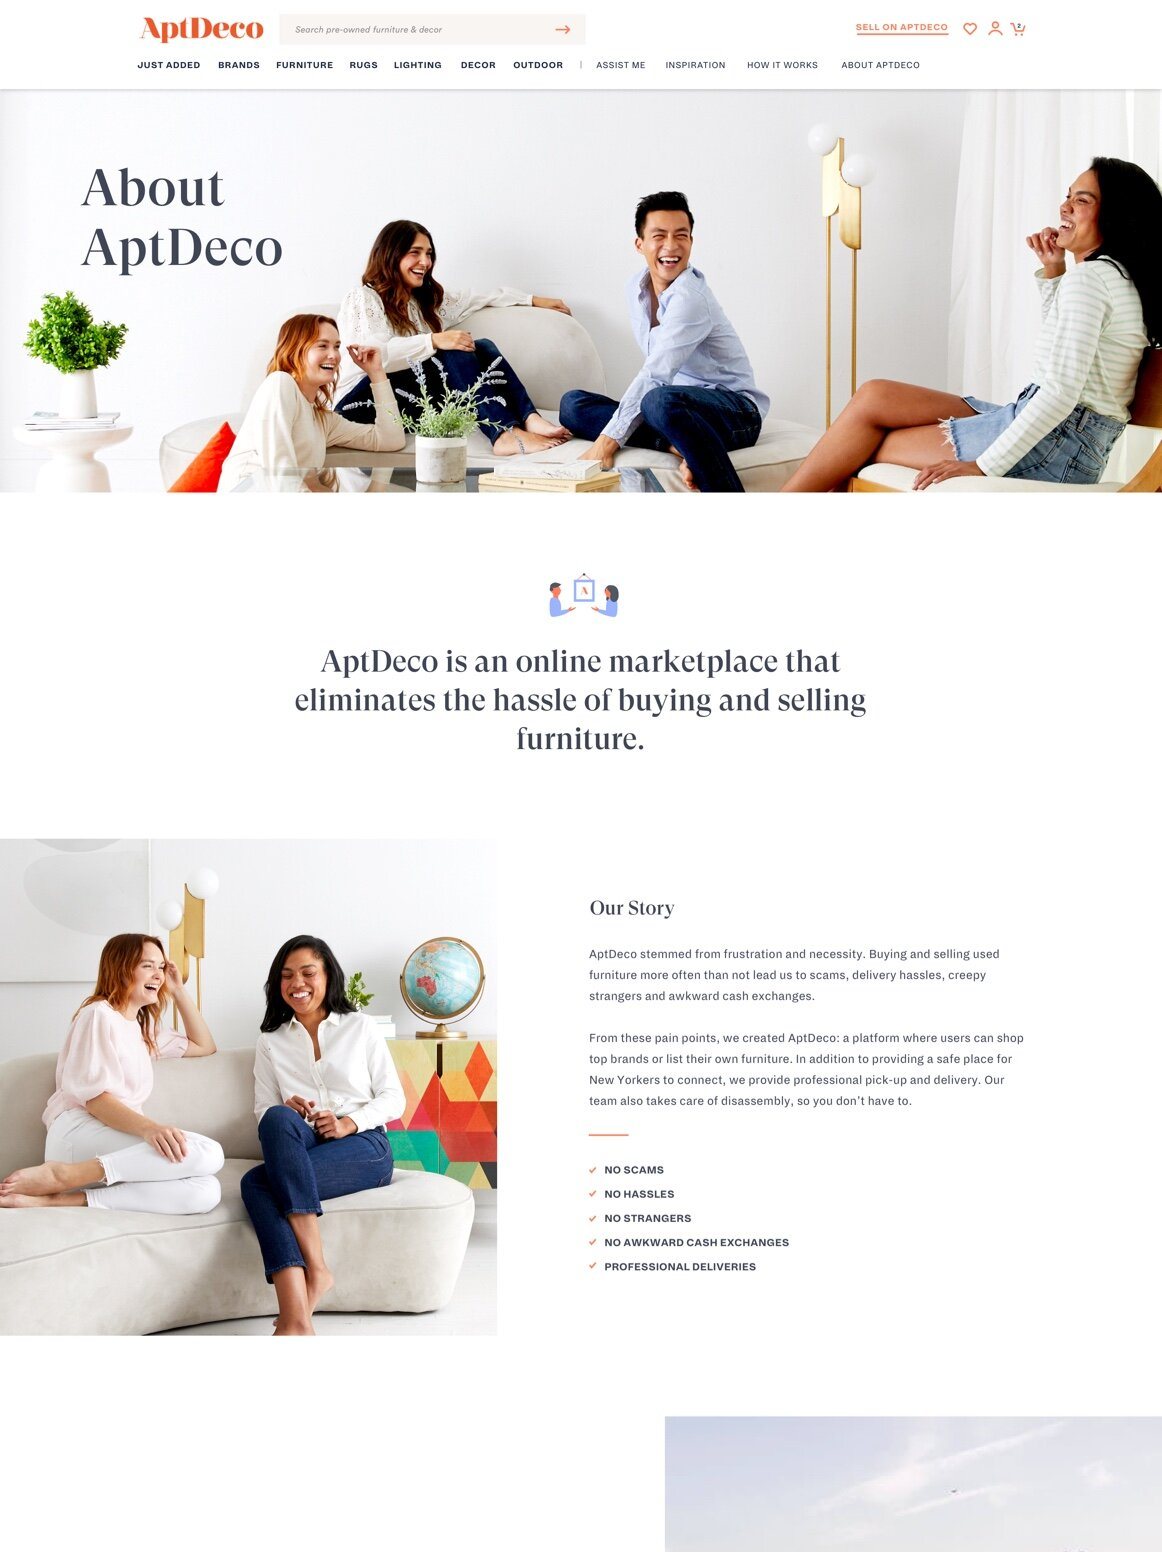 aptdeco-hearst-hearstlabs-decor-wildes-district-new-york-design-web-agency-06.jpg